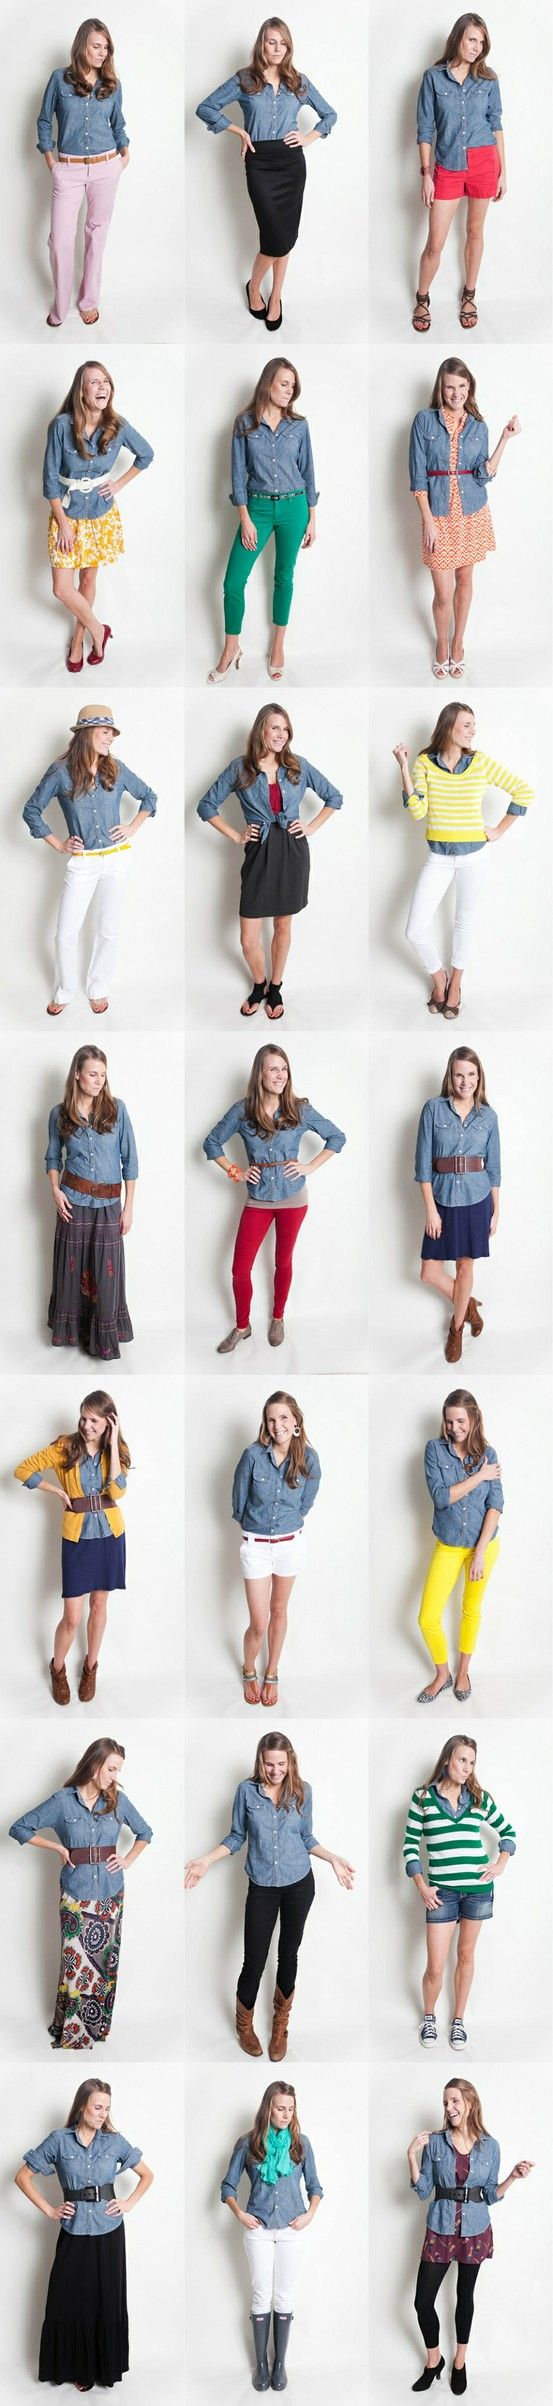 Chambray shirt ideas: Shirts Ideas, Fashion Ideas, Chambray Shirts Outfits, Jeans Shirts, Denim Tops, Chambray Style, Denim Shirts, Buttons, Outfits Ideas